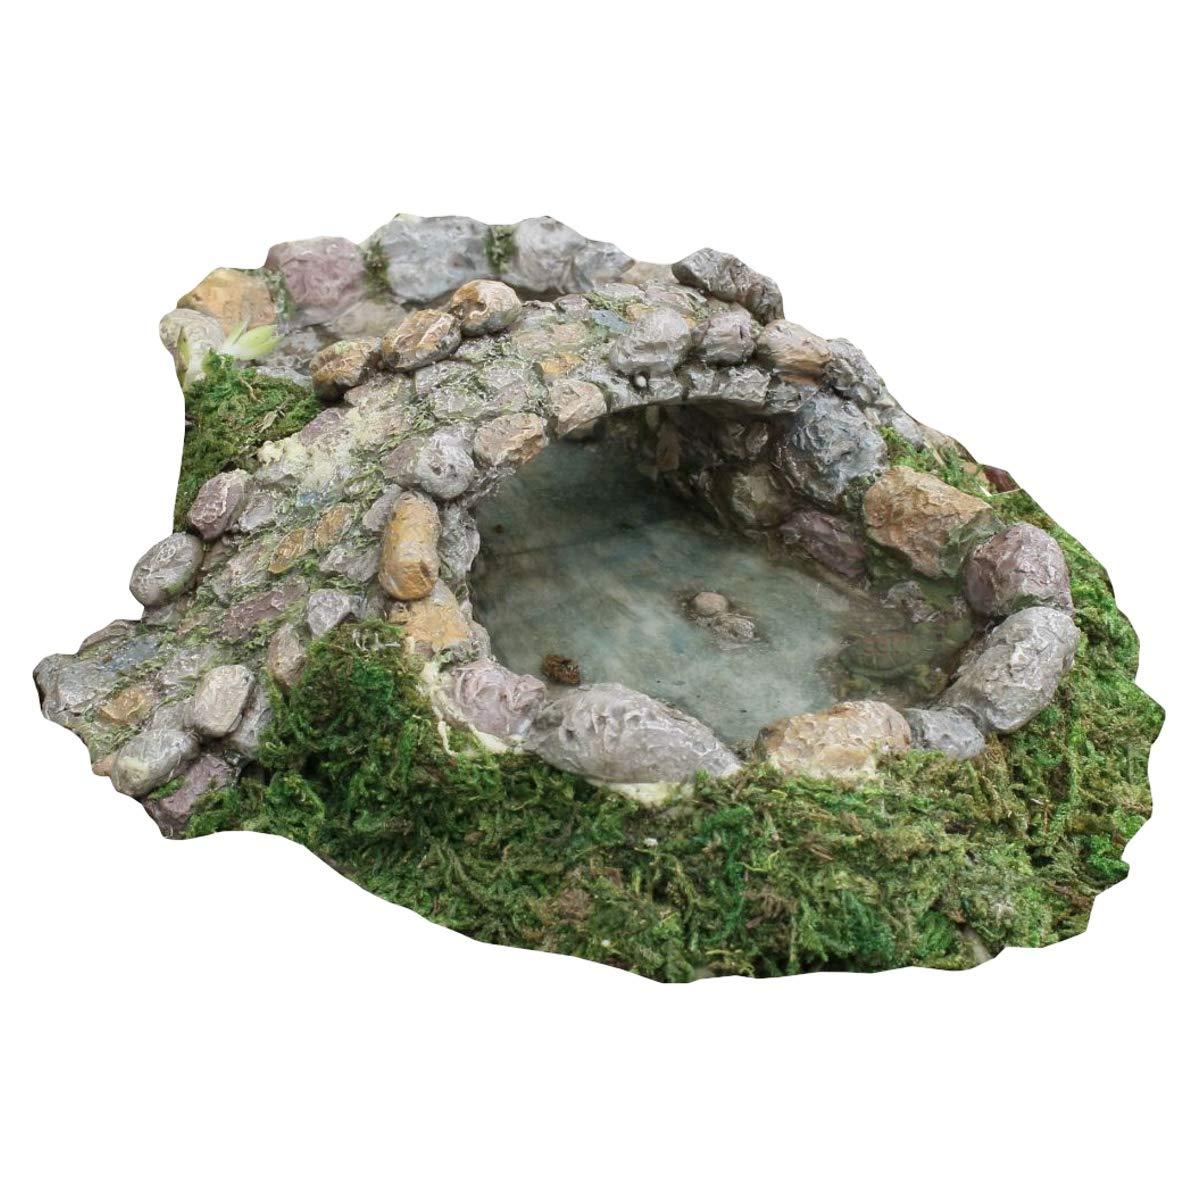 TG,LLC Treasure Gurus Miniature Fairy Garden Stone Pond and Bridge Ornament Dollhouse Decor Accessory